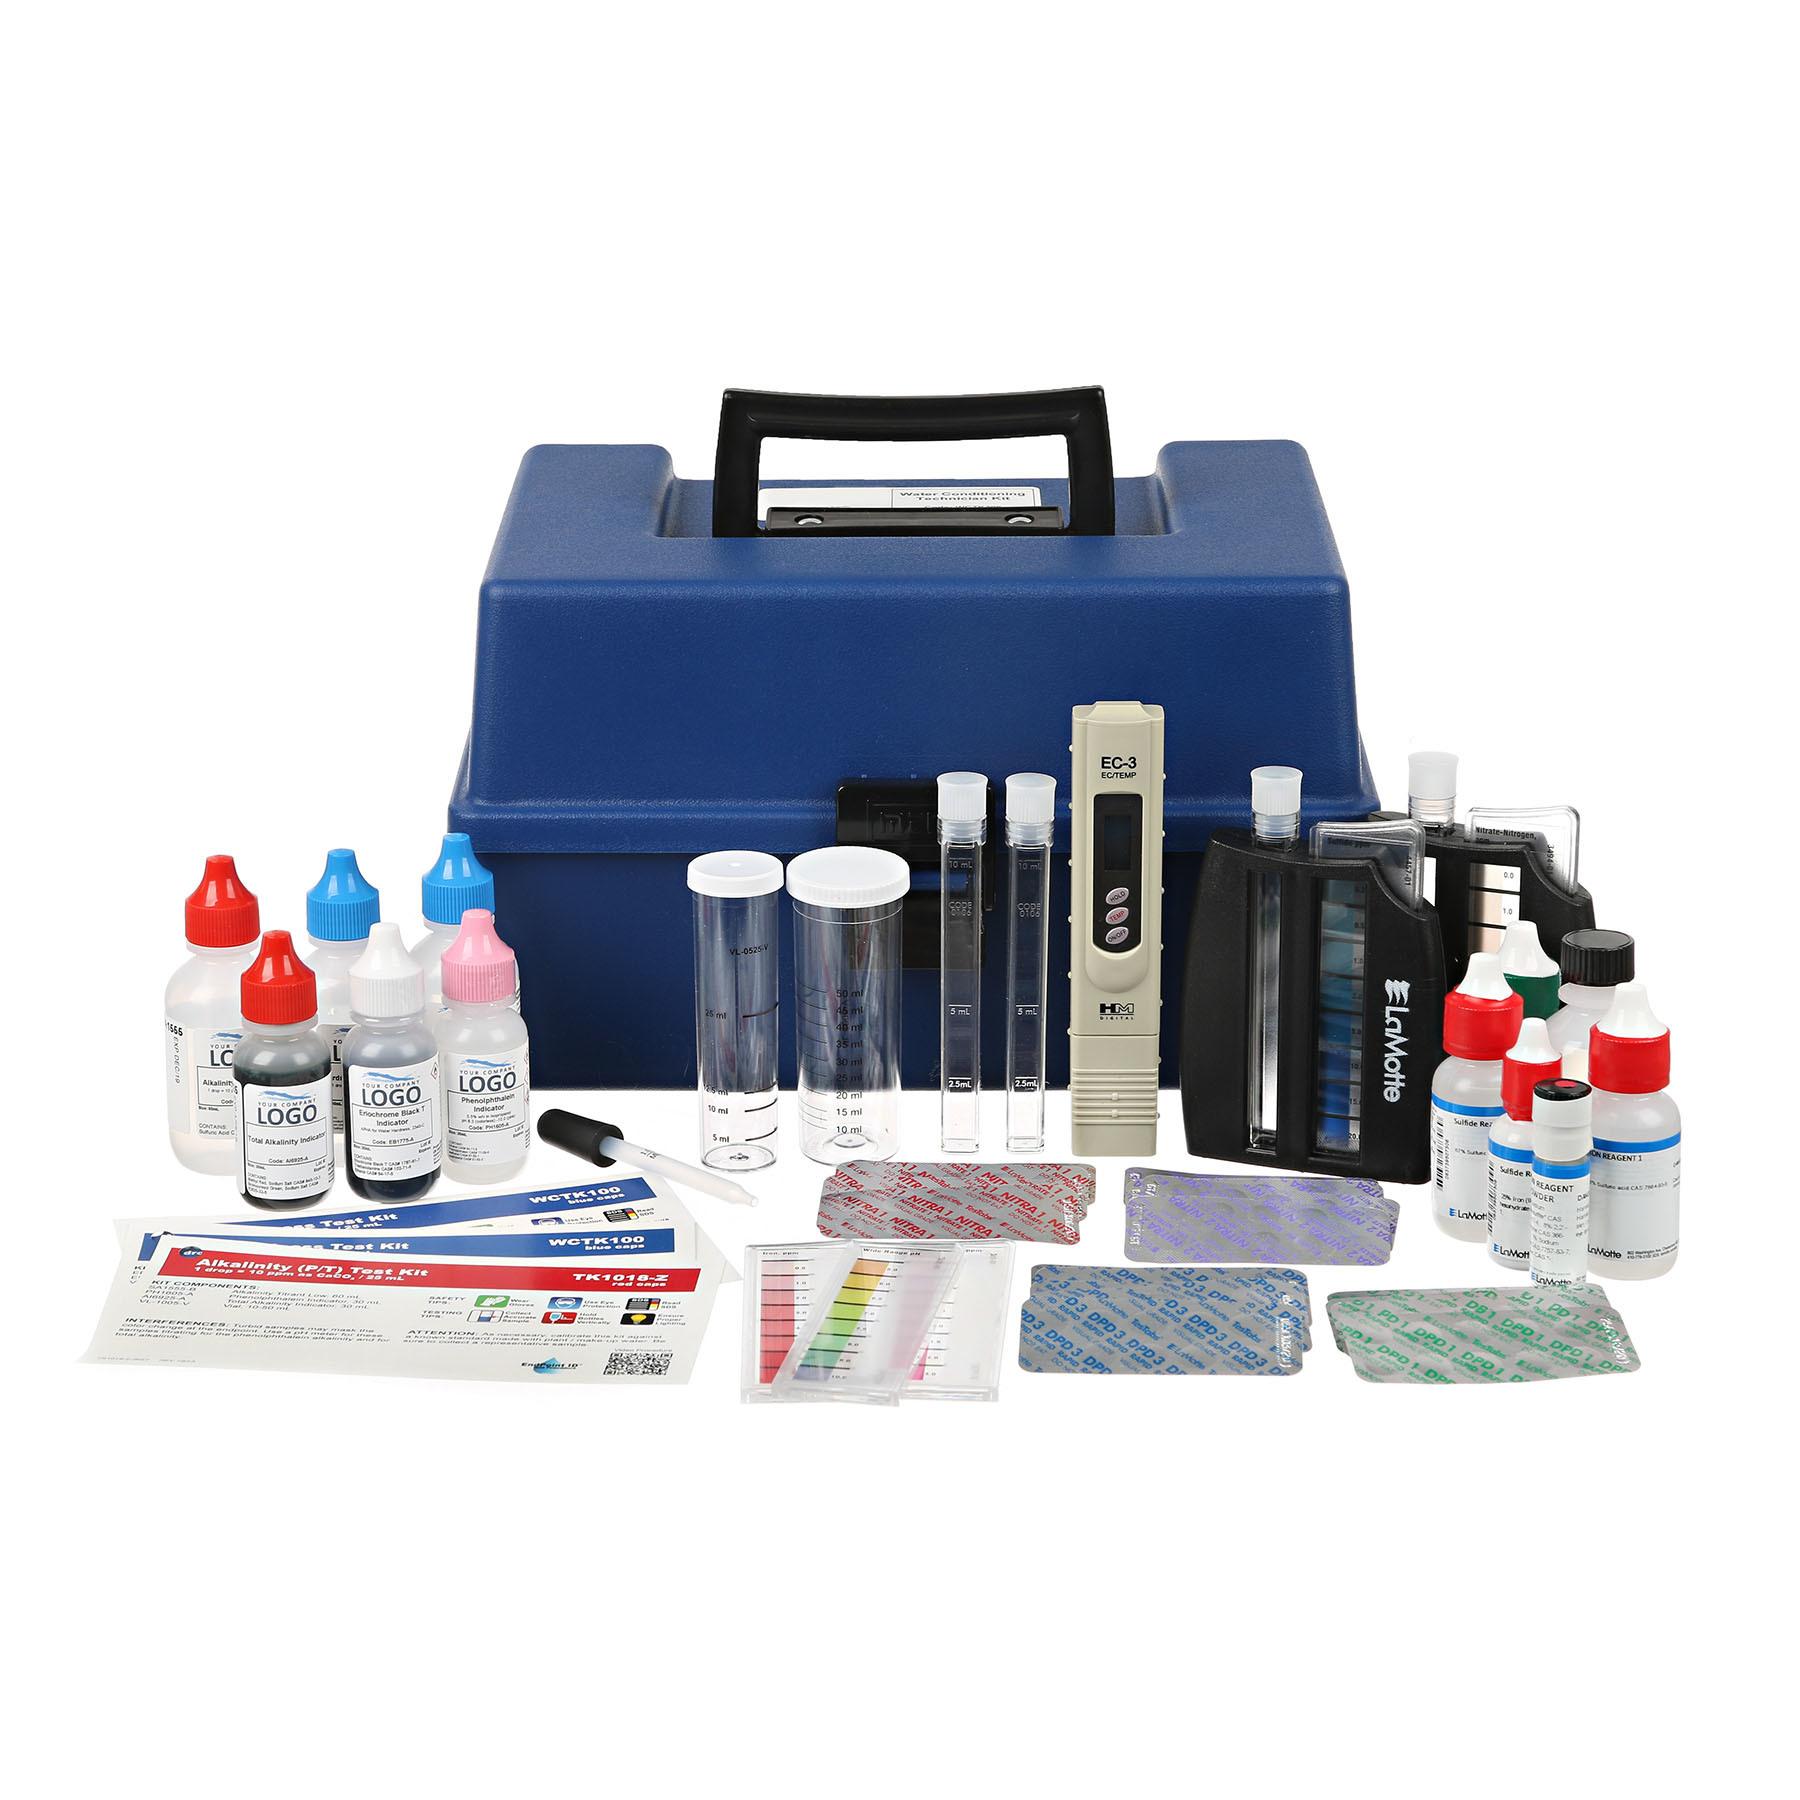 Chemical Test Kits